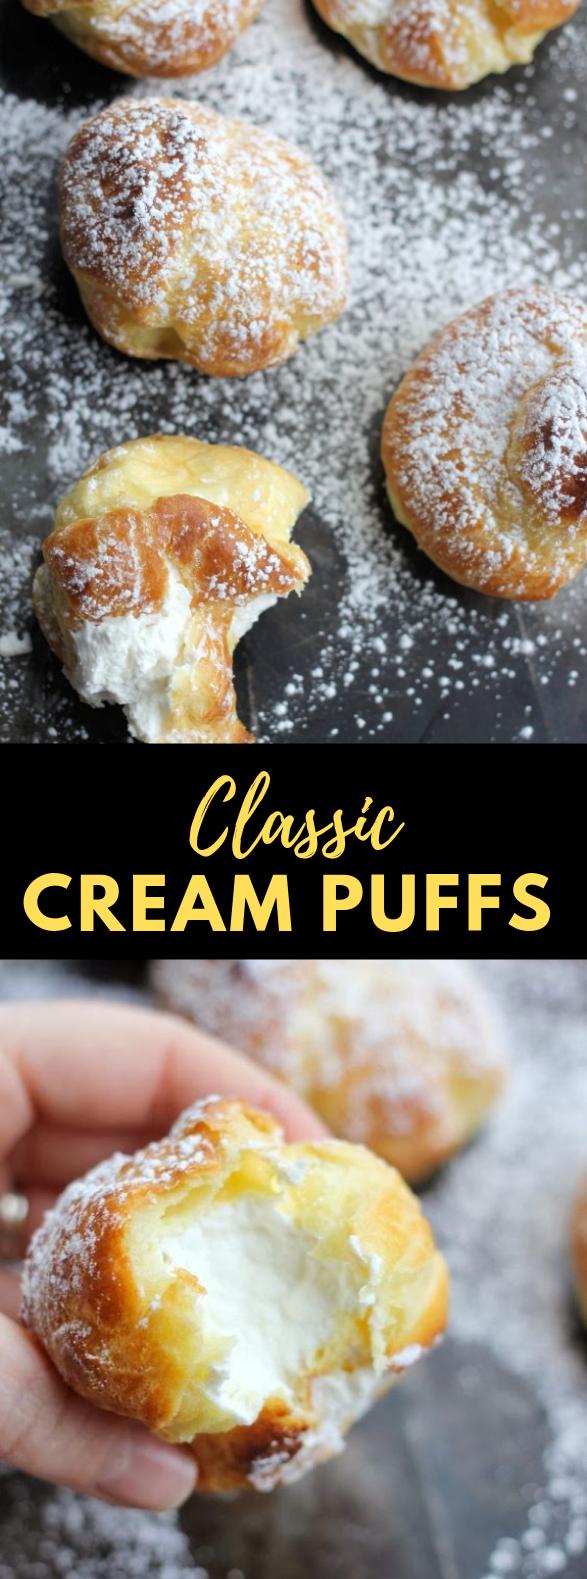 HOW TO MAKE CREAM PUFFS, CLASSIC CREAM PUFFS #Dessert #Pastry